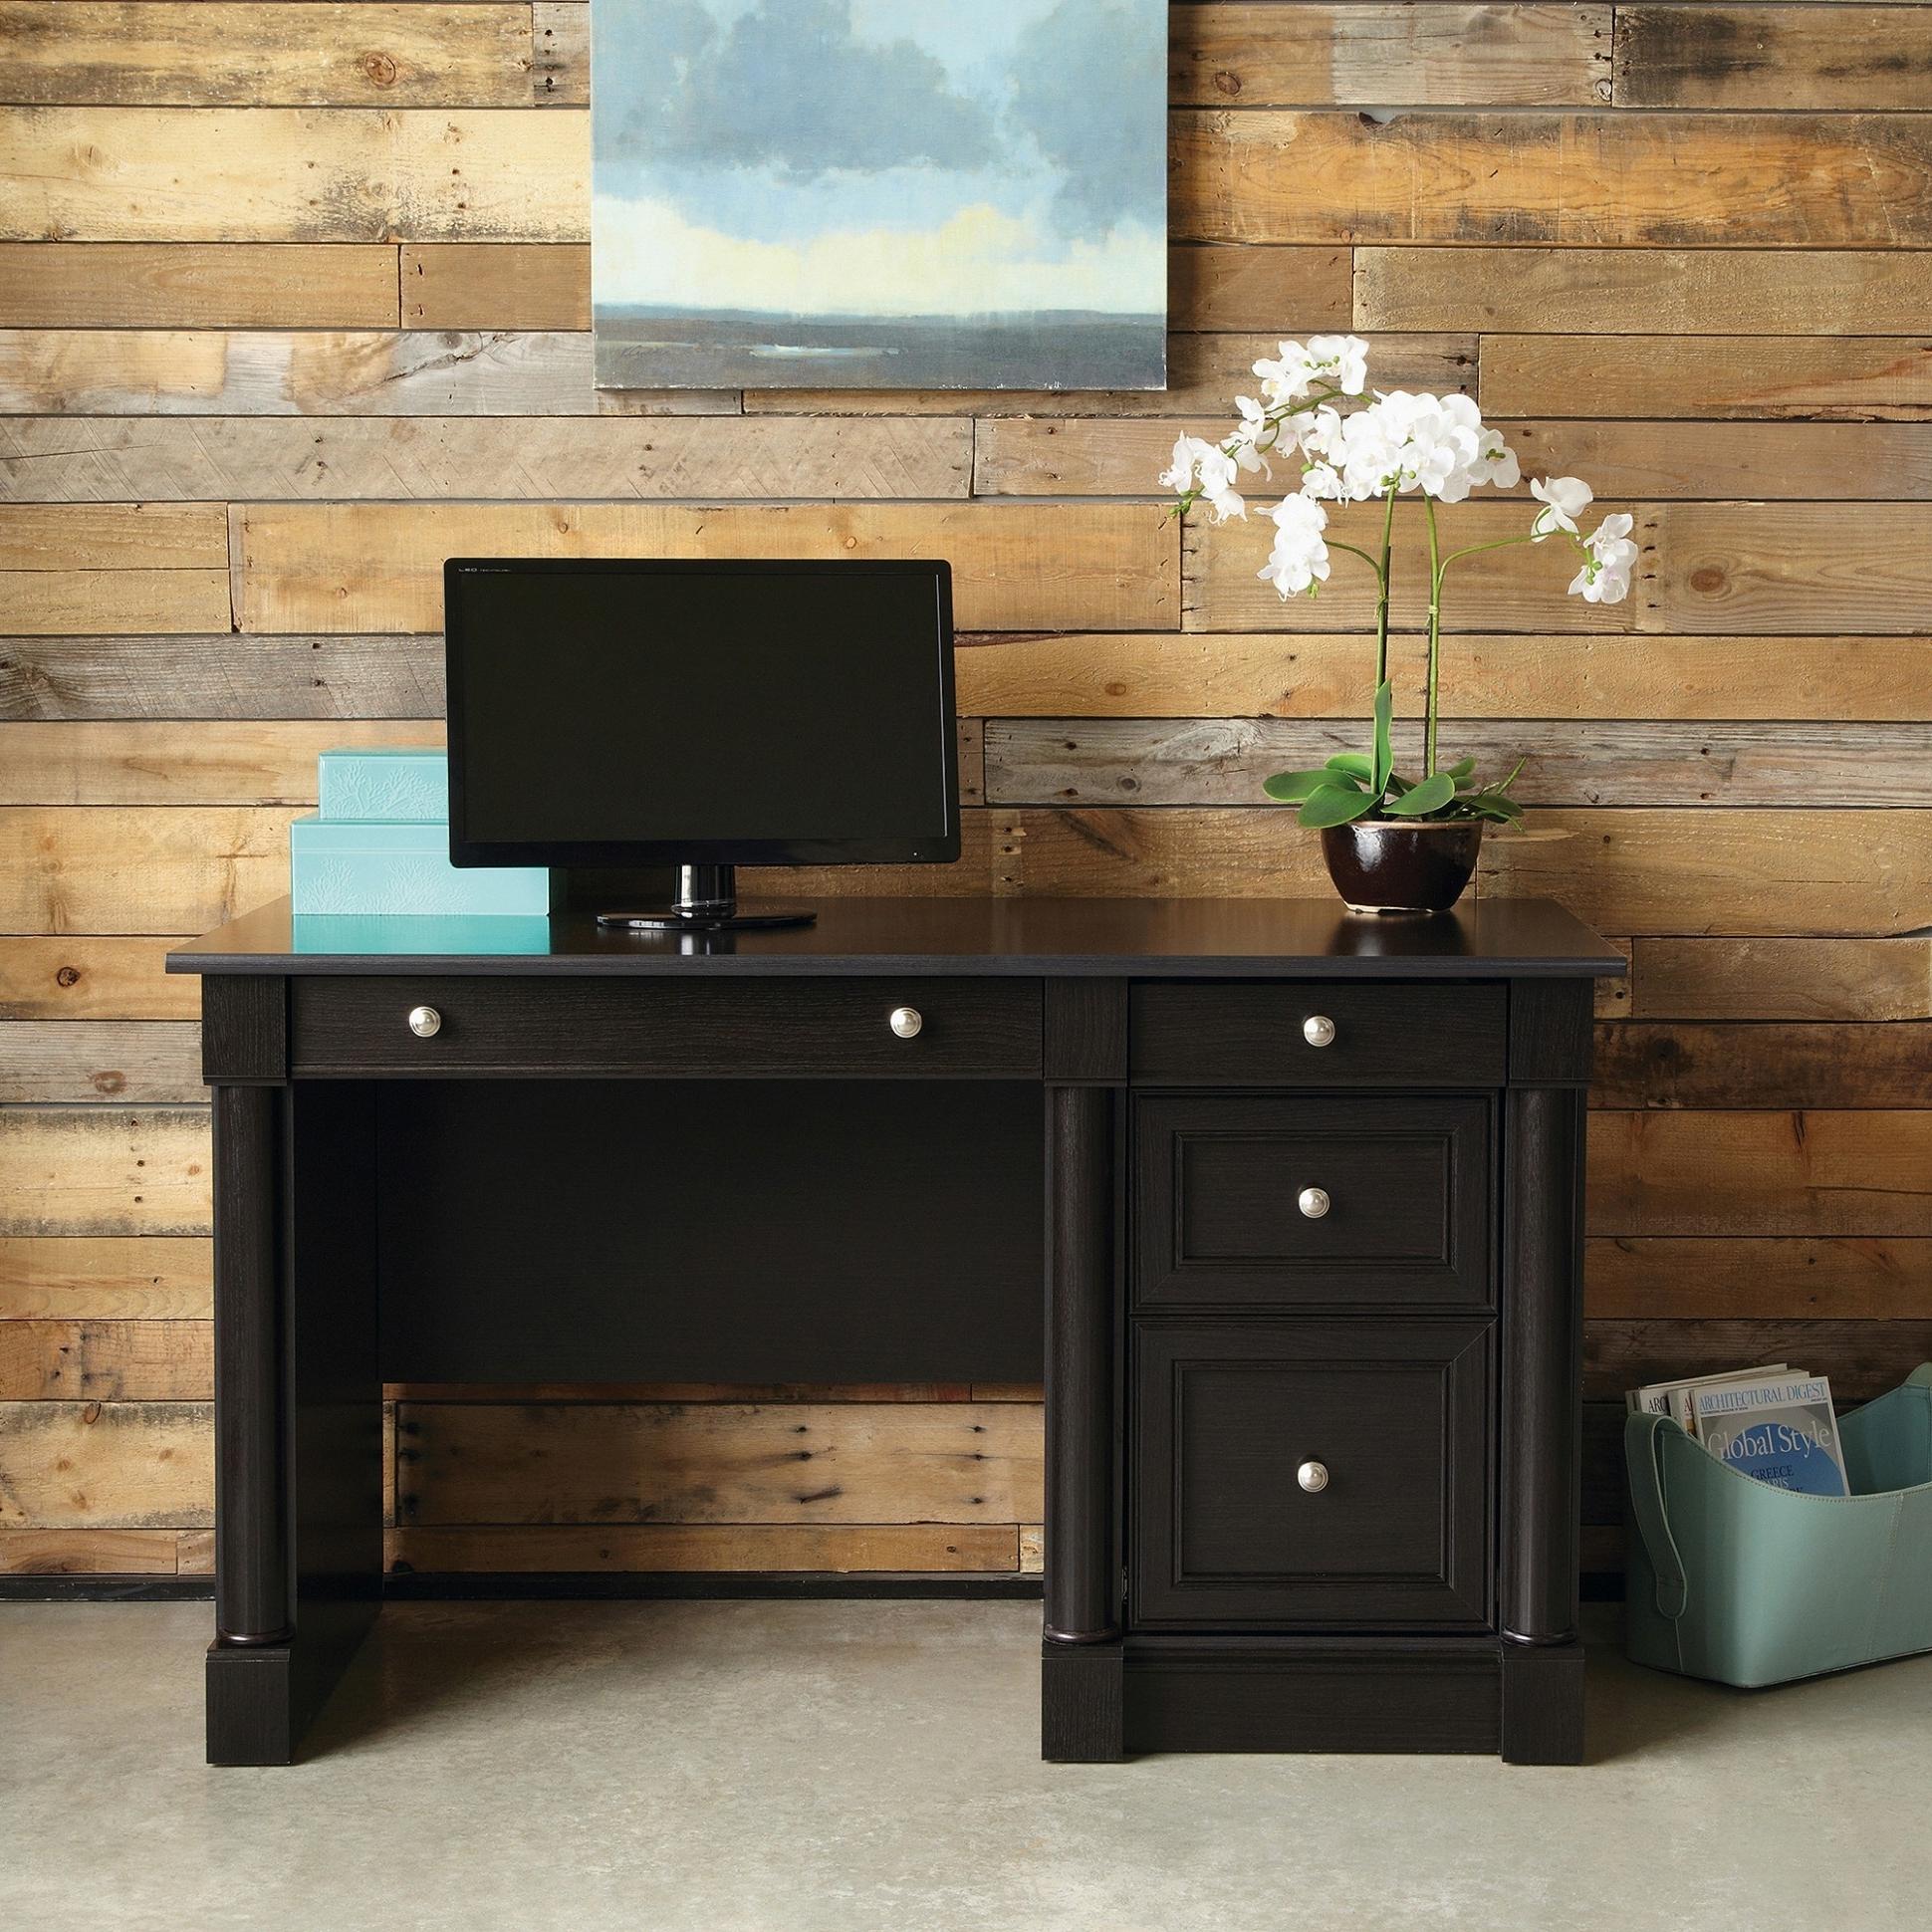 Top 67 Ace Kids Study Desk Target Beds Outdoor Furniture Student For Recent Computer Desks At Target (View 11 of 20)